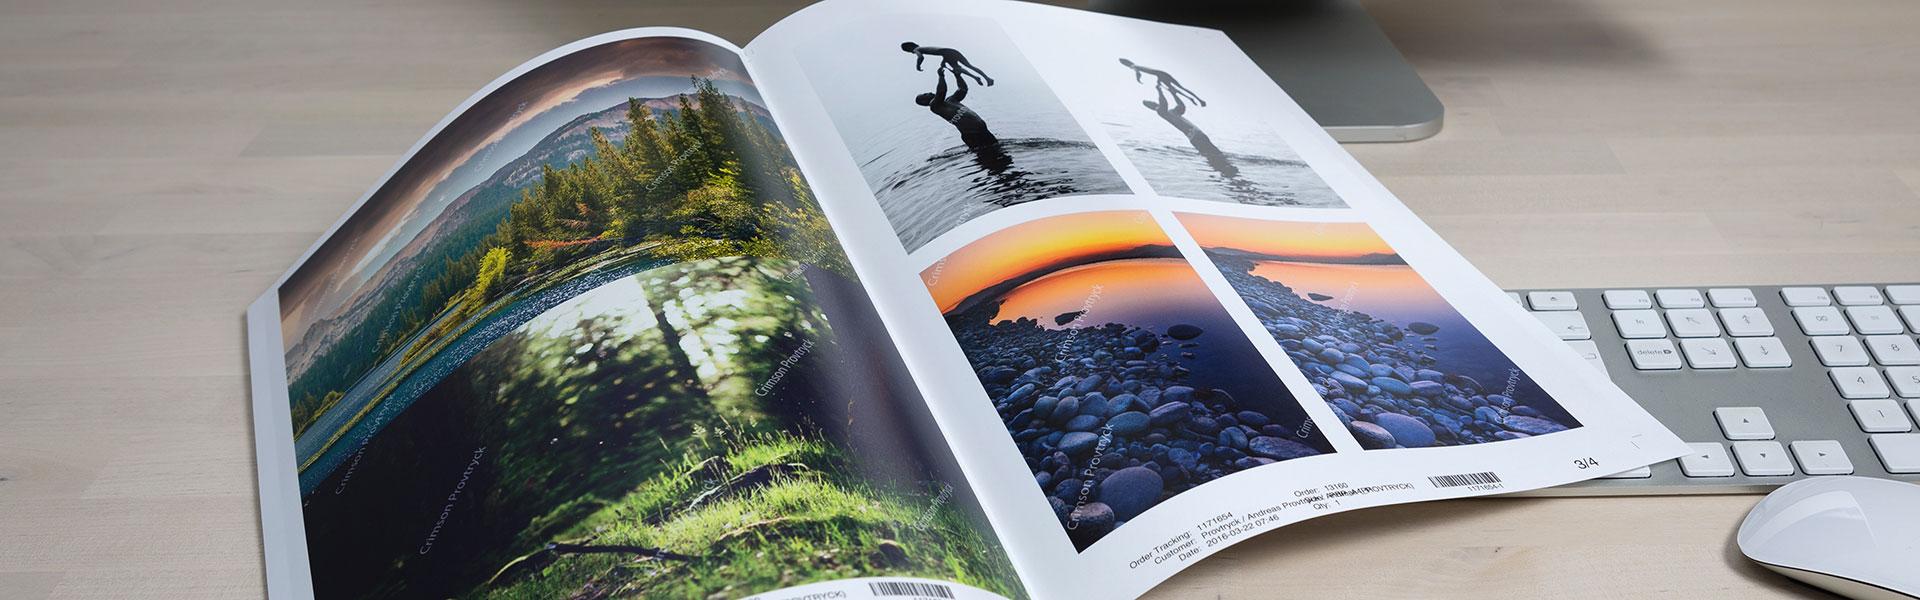 Provtryck fotokalender